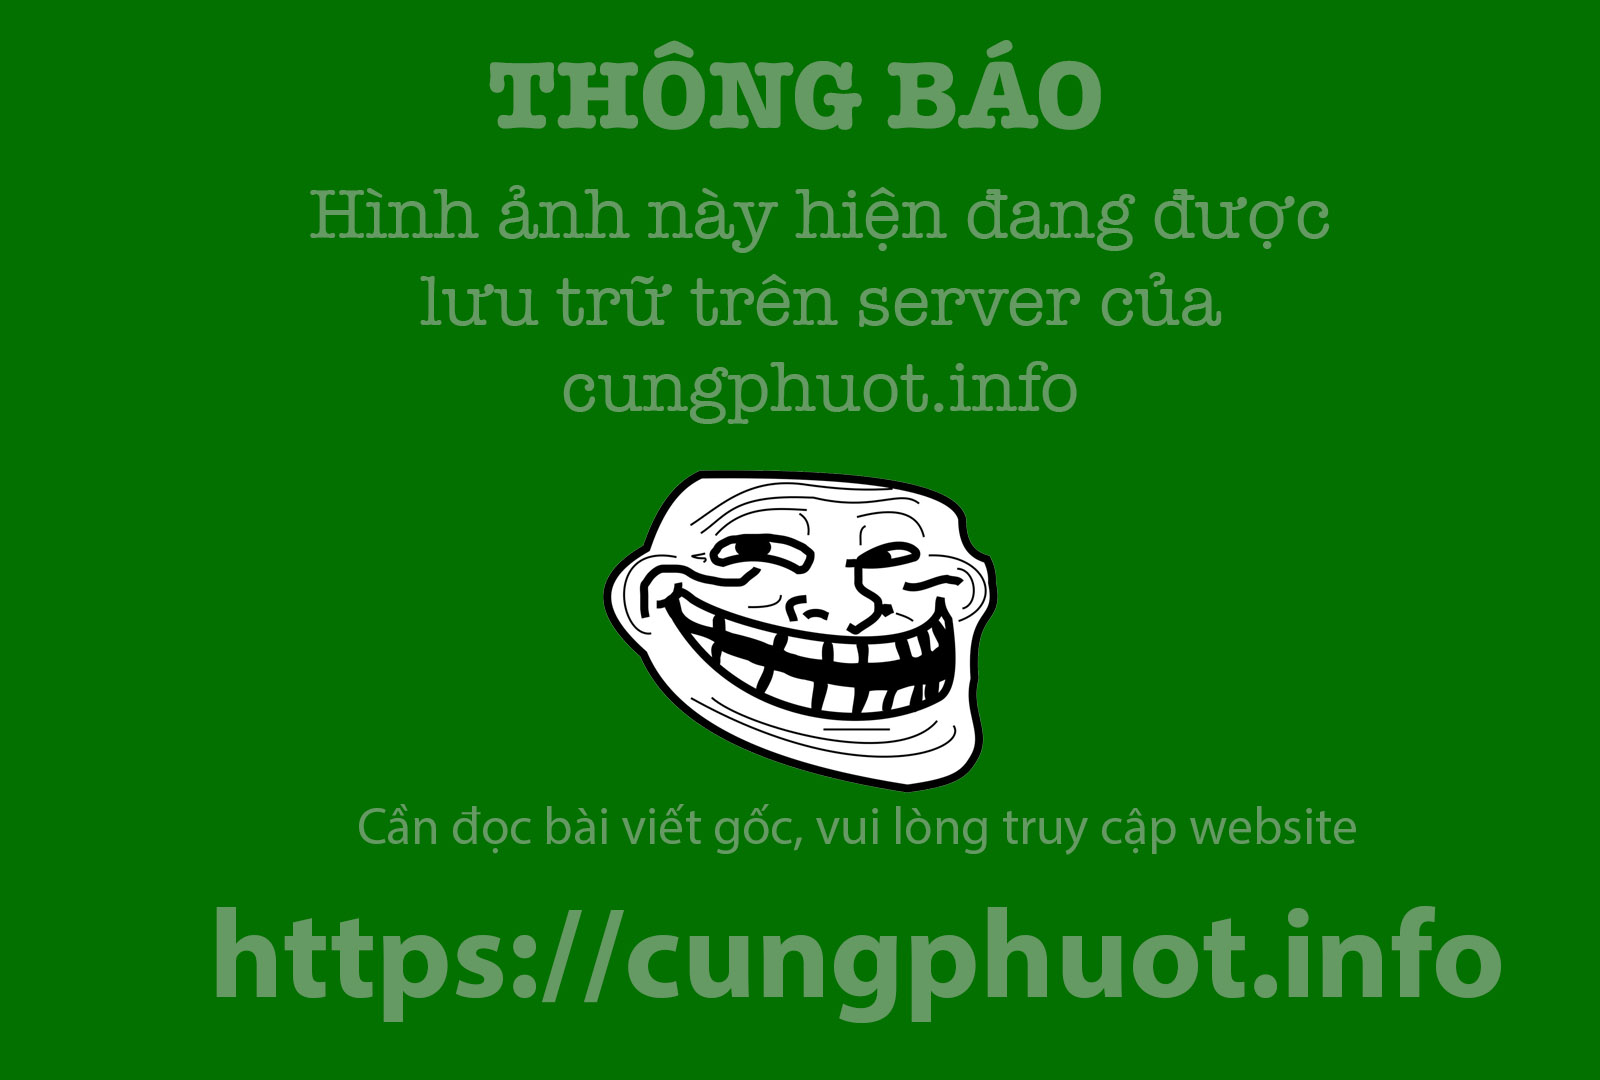 Co do Hue dep la trong suong mu hinh anh 16